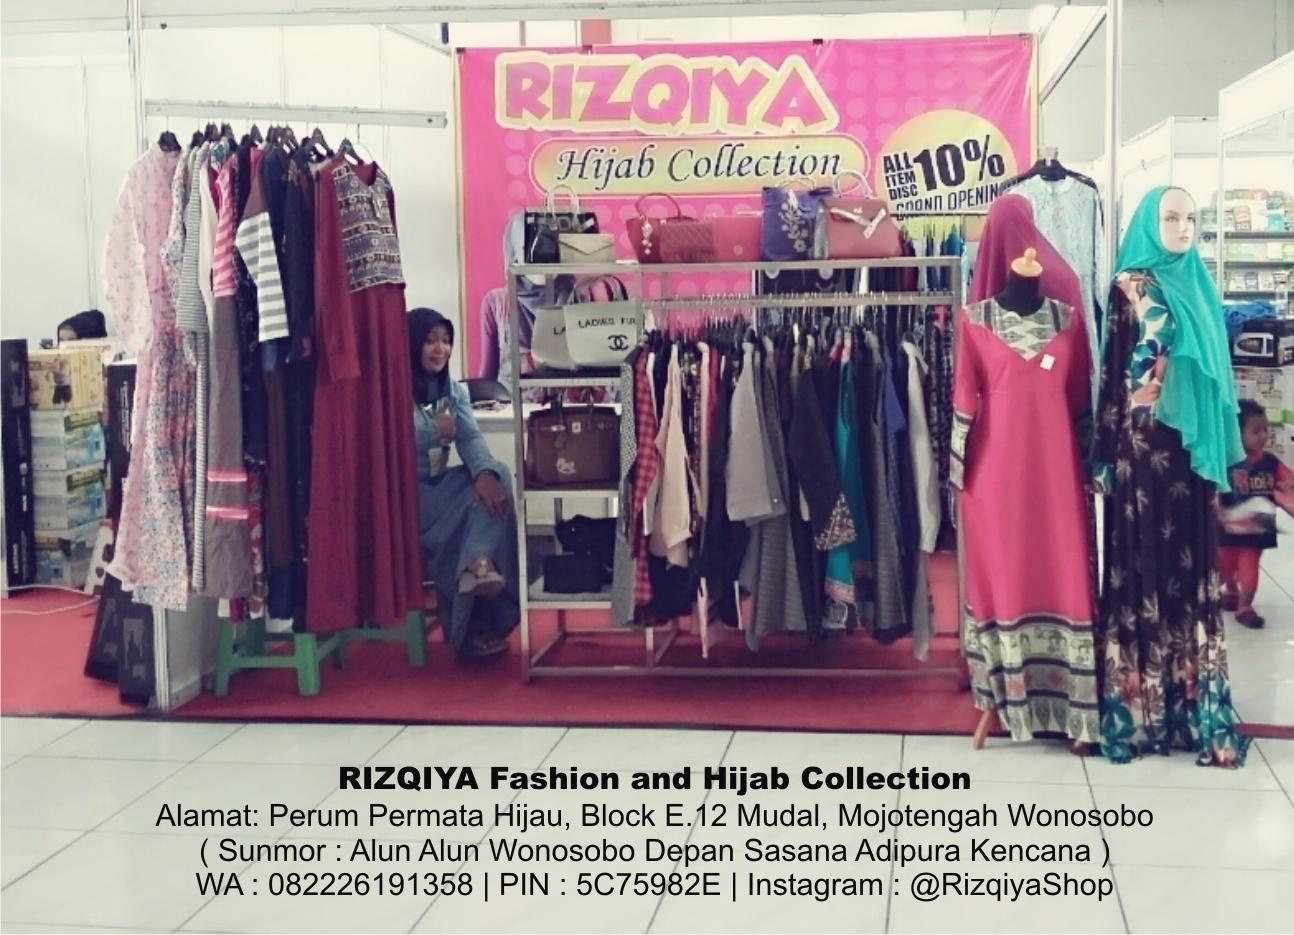 Rizqiya Shop Mudal Mojotengah